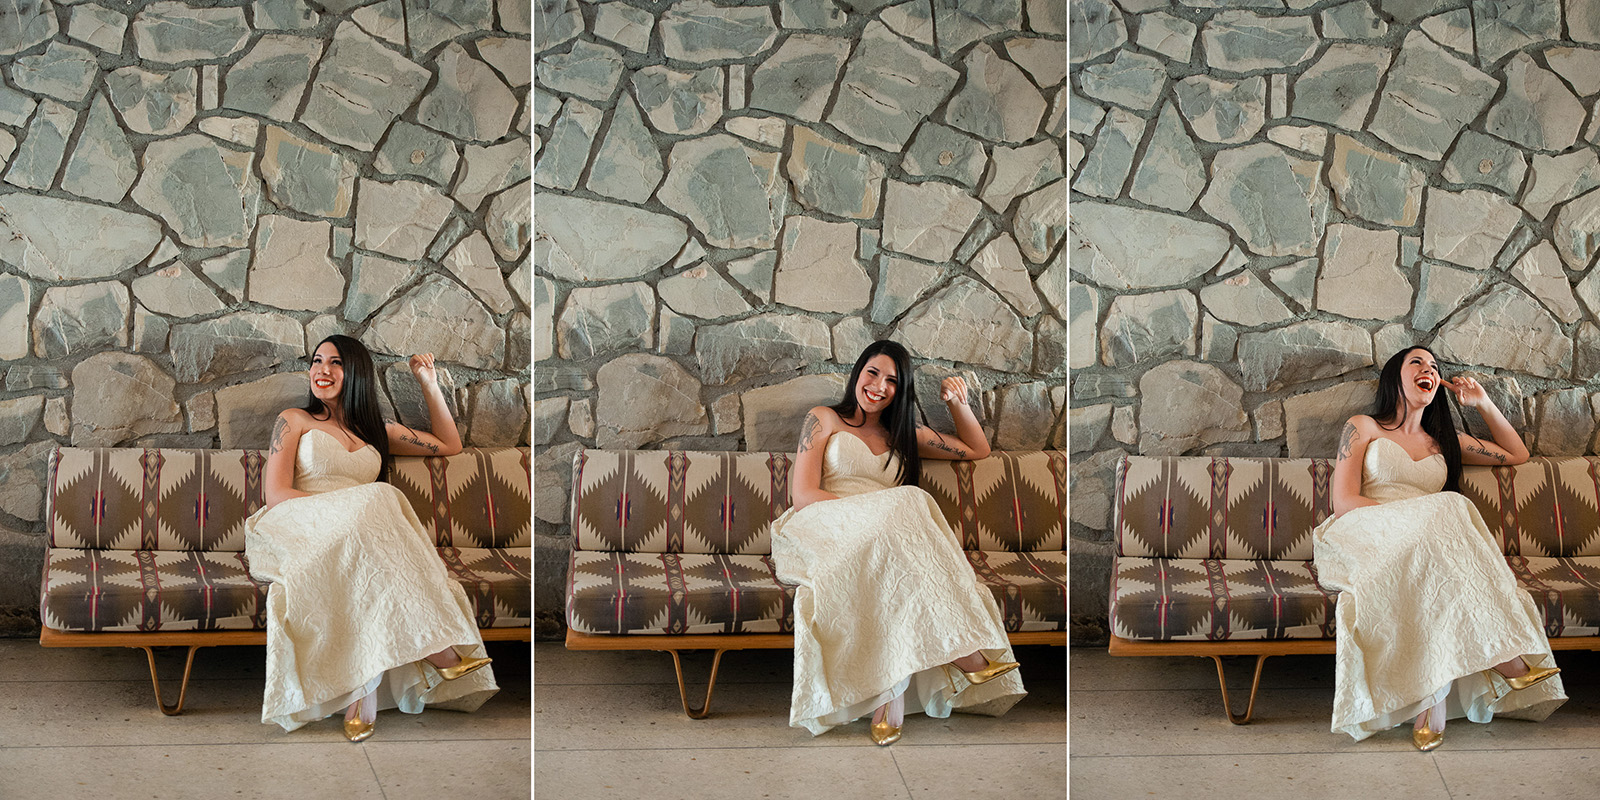 ace-hotel-palm-springs-wedding-33.jpg